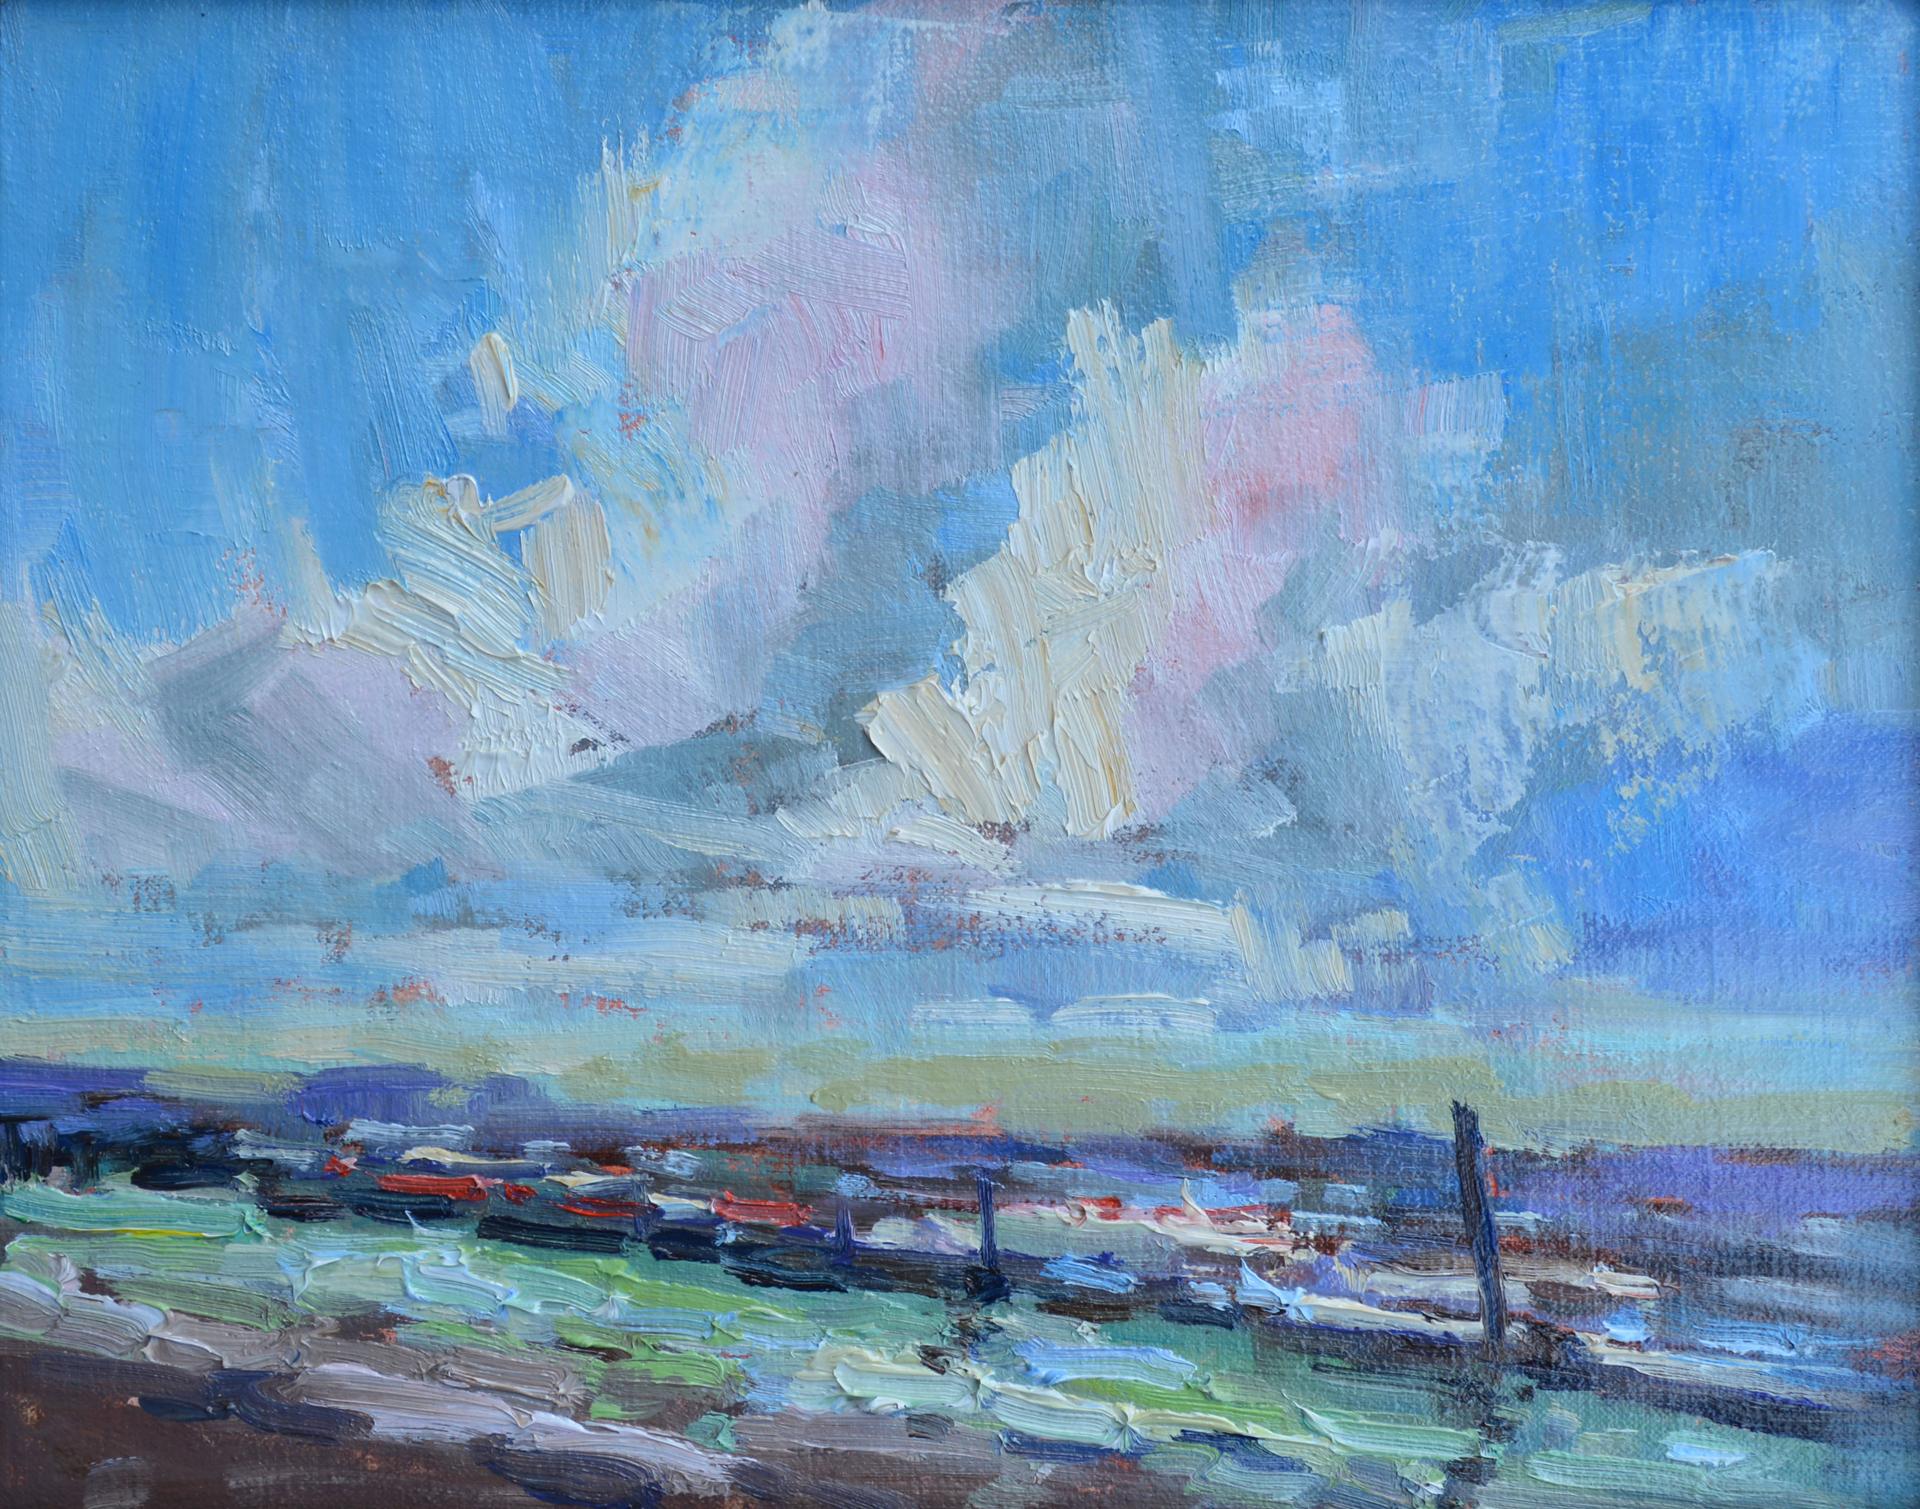 Big Clouds Over the Marina by Karen Hewitt Hagan